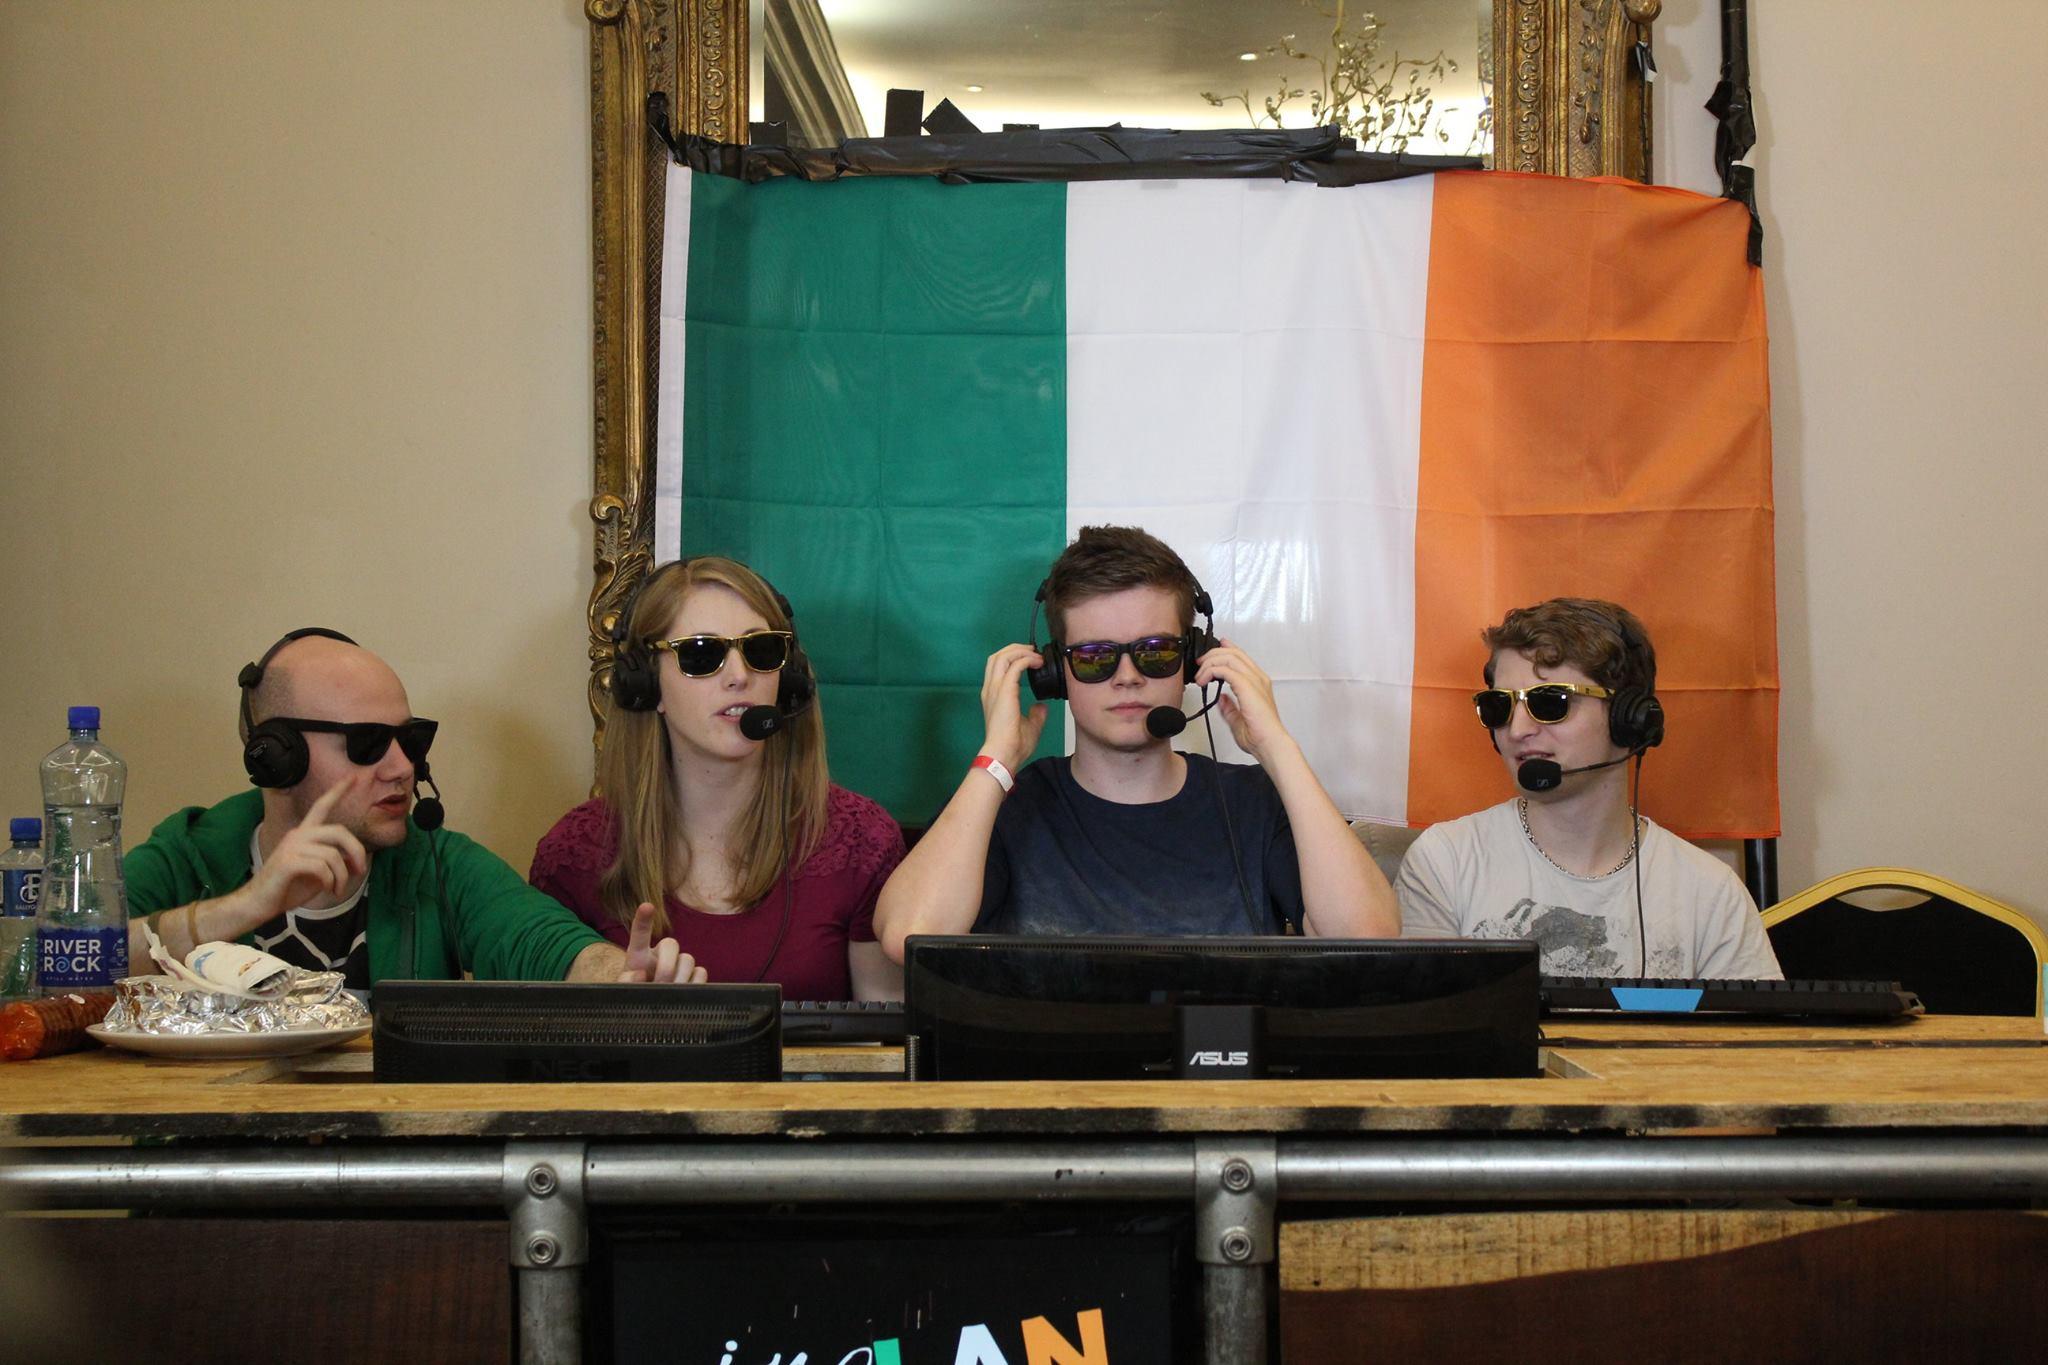 Sheever IreLAN Host Esports Dota 2